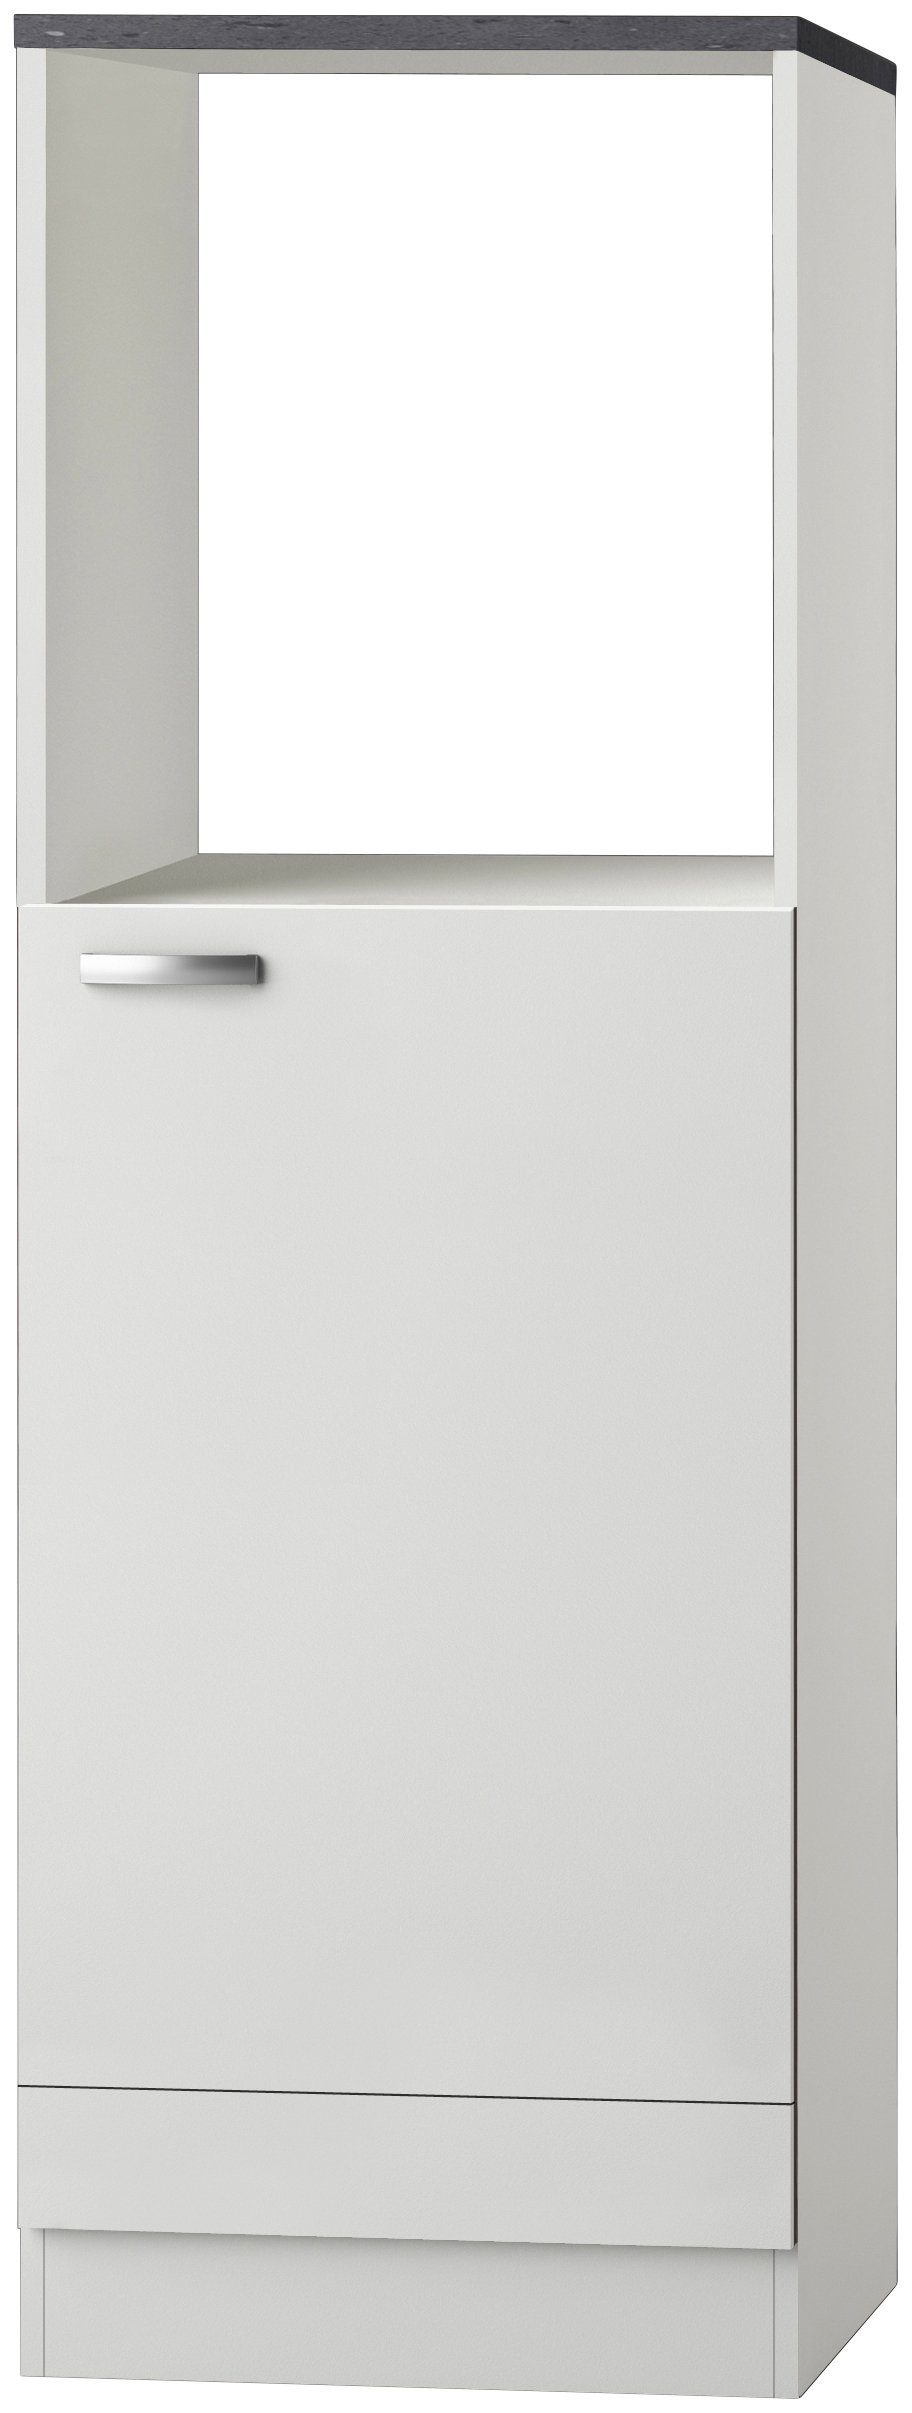 Optifit Kombinierter Backofen-Kühlumbauschrank »Lagos, Breite 60 cm«